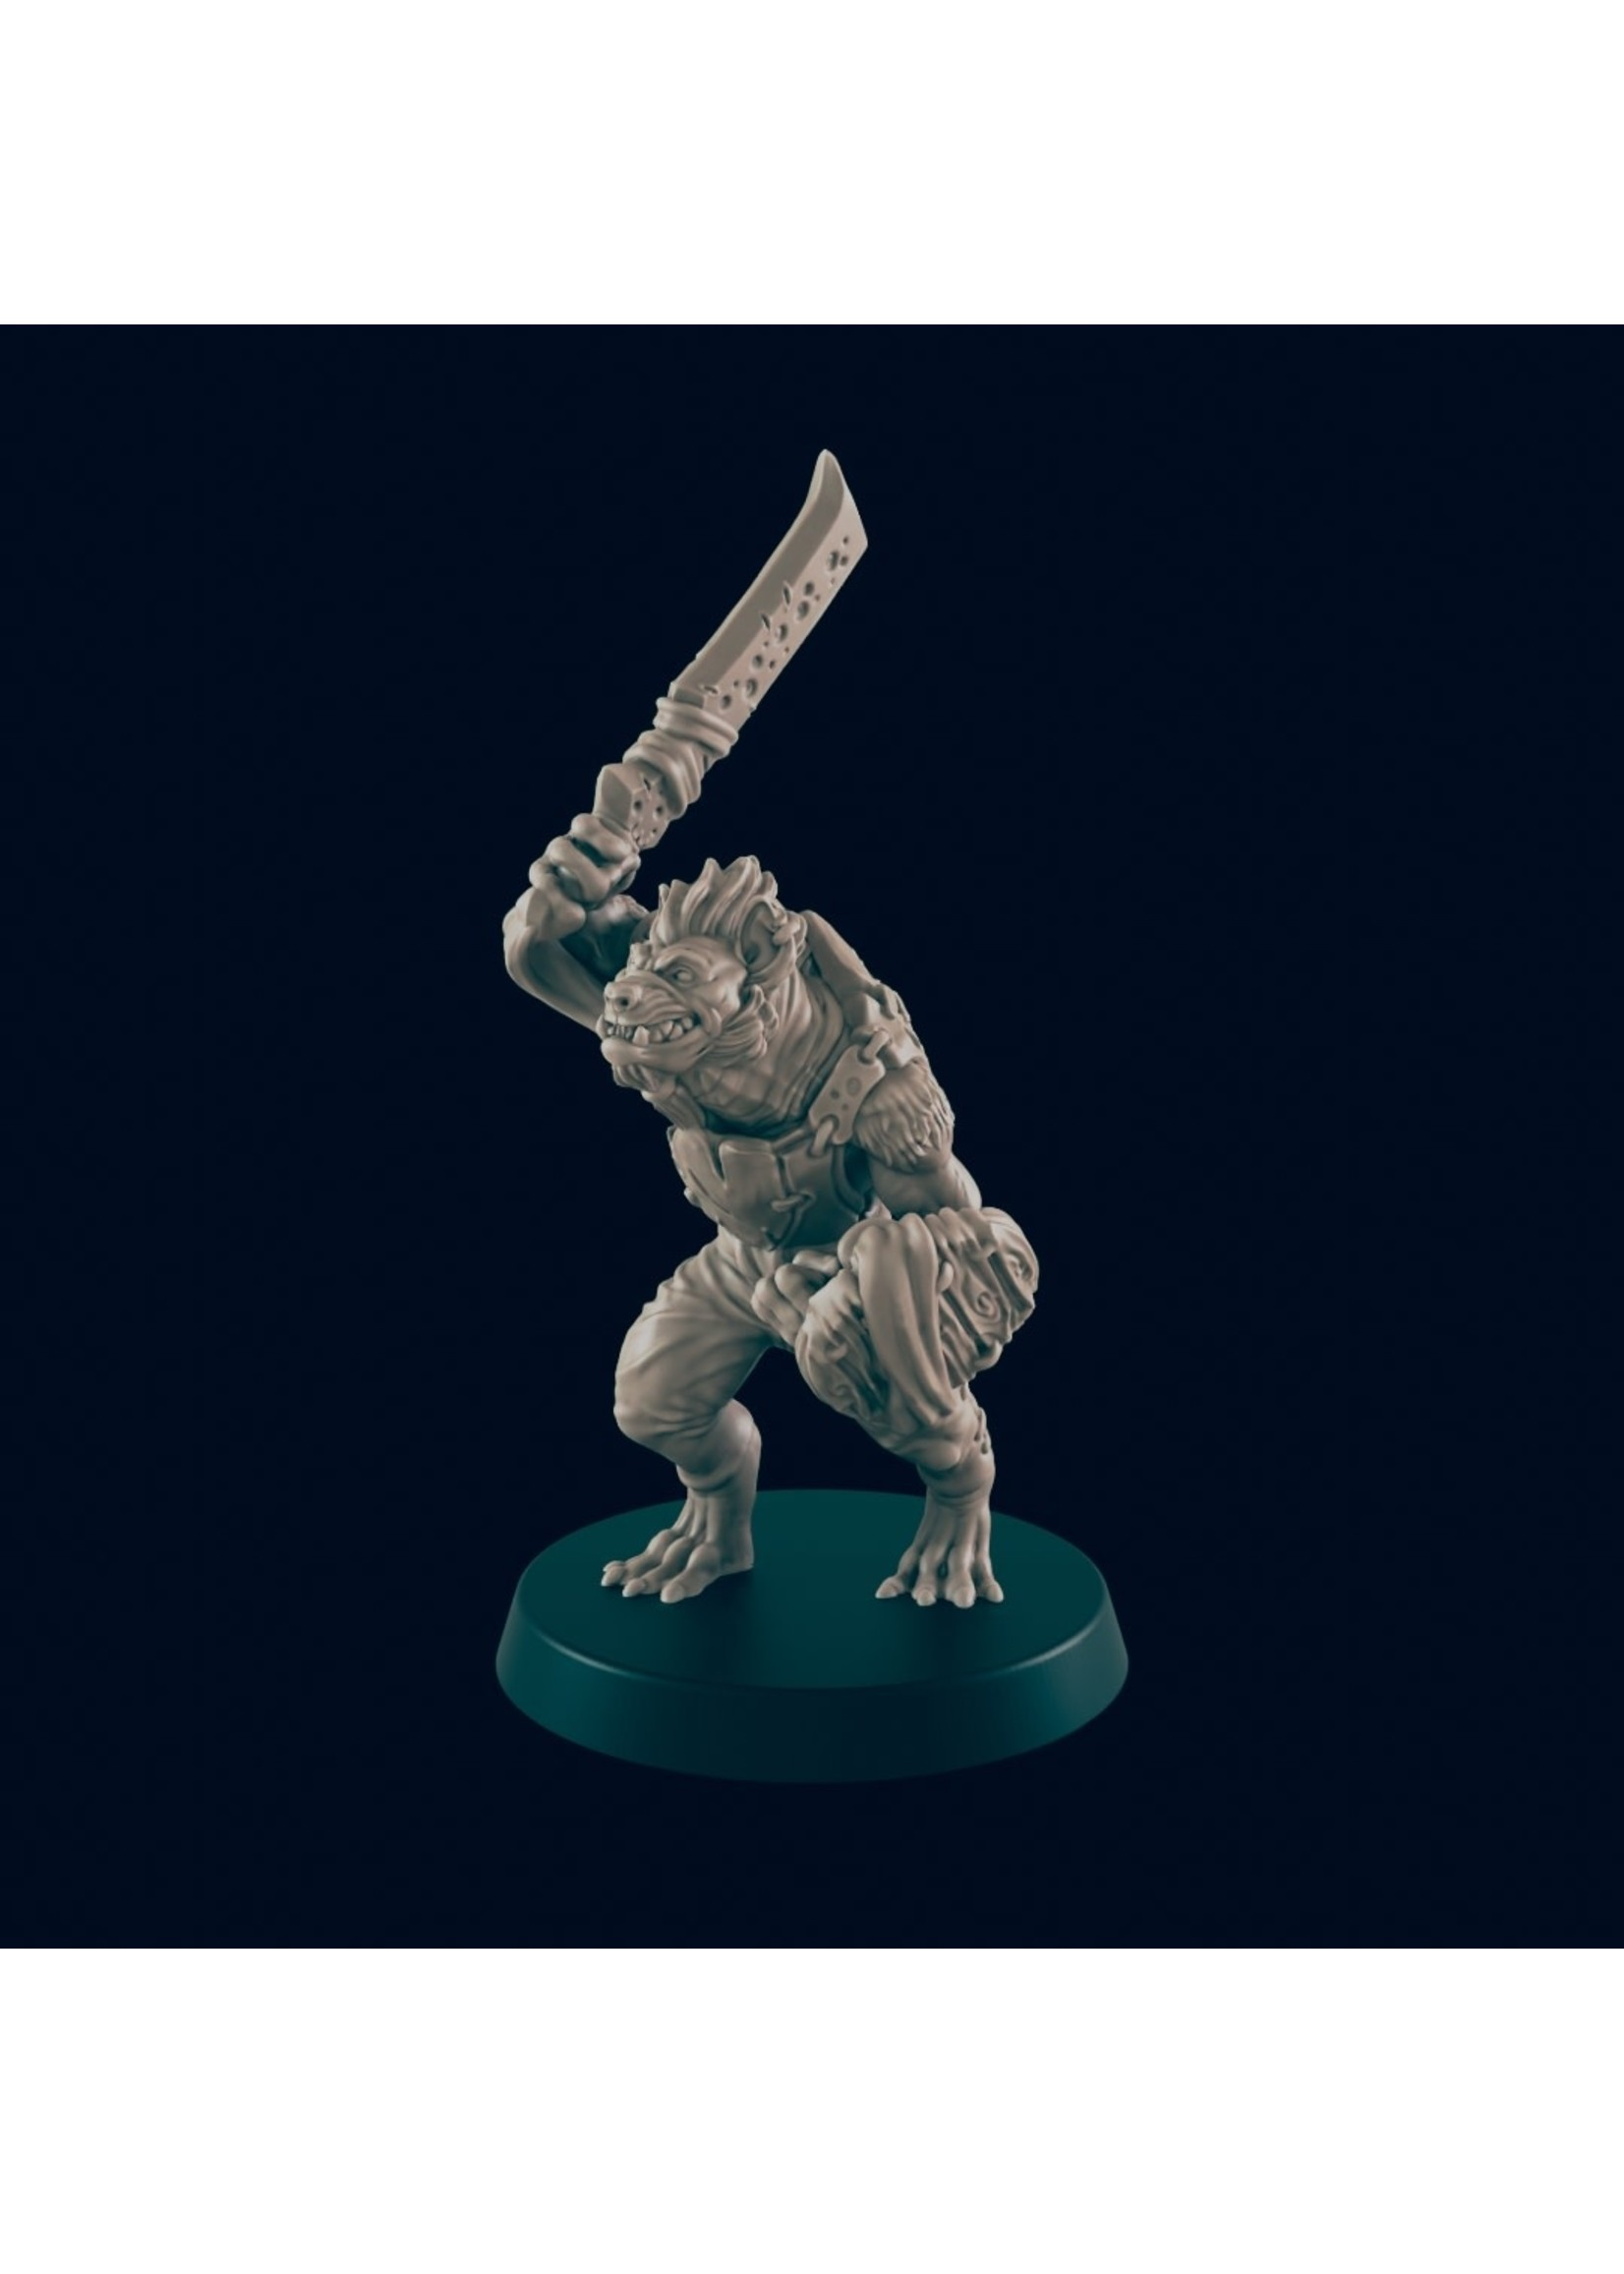 3D Printed Miniature - Gnoll Warrior - Dungeons & Dragons - Beasts and Baddies KS